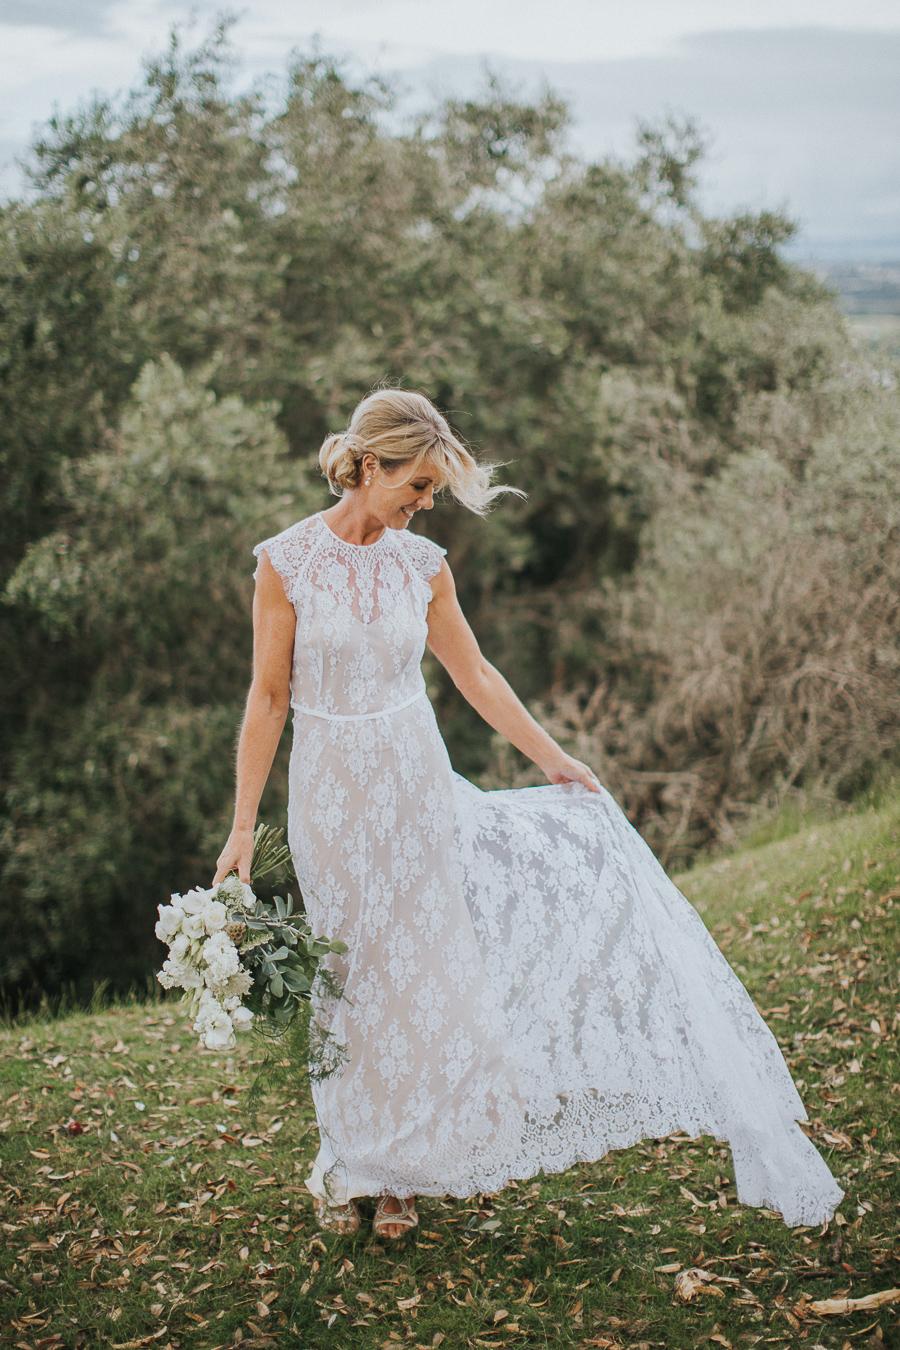 Auckland wedding photographer Victoria Mike093.JPG